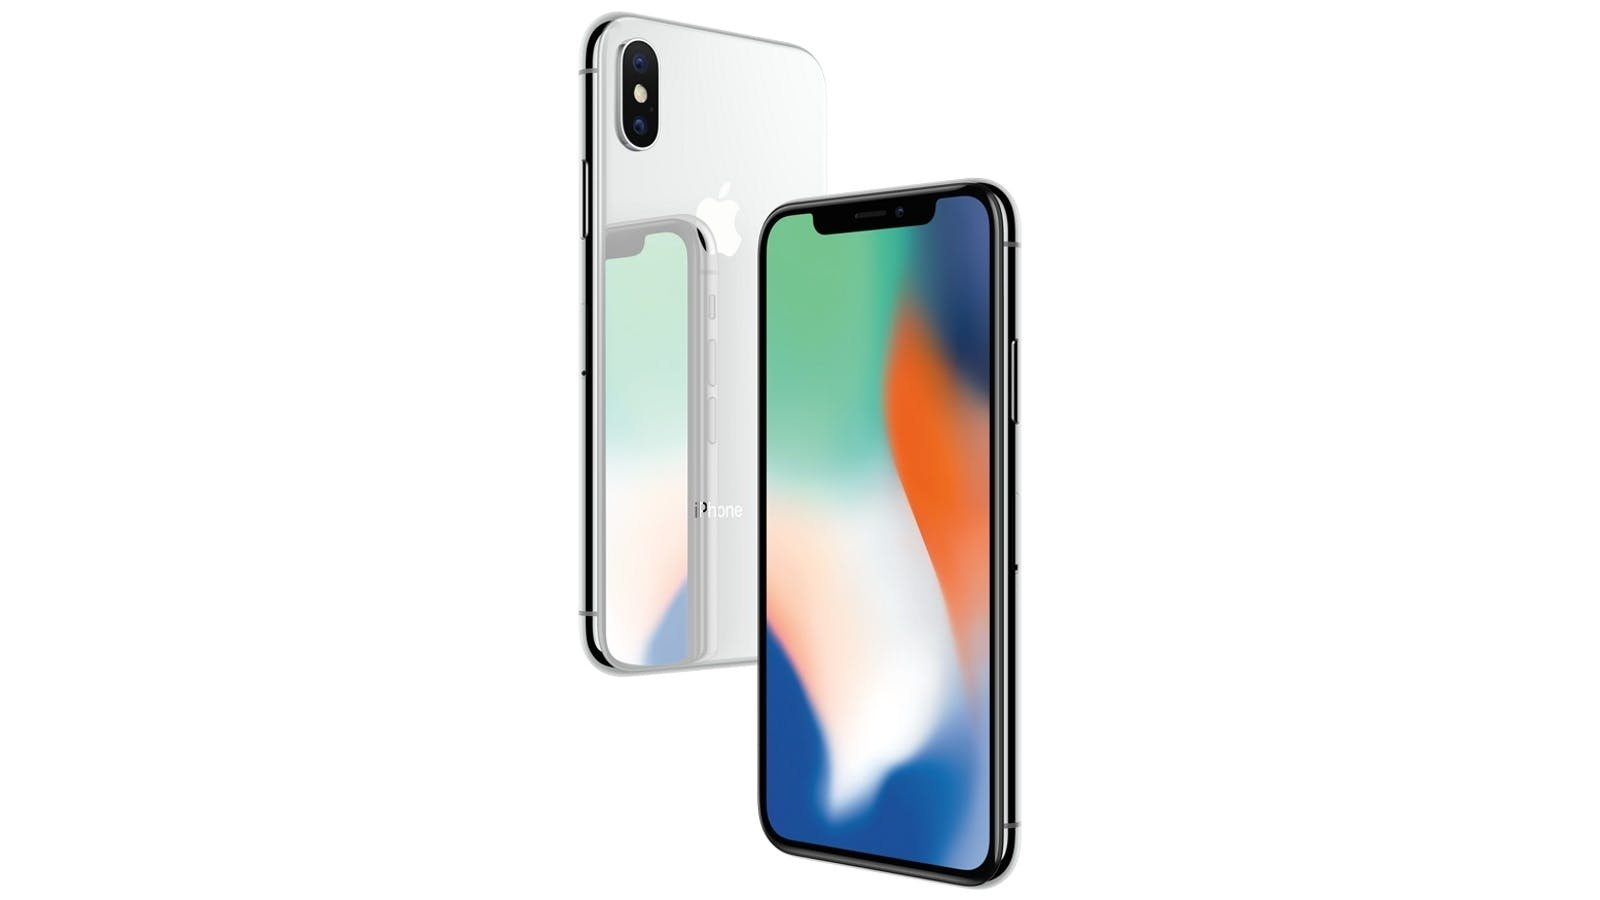 Apple Iphone X 64GB GSM Unlocked - US Silver